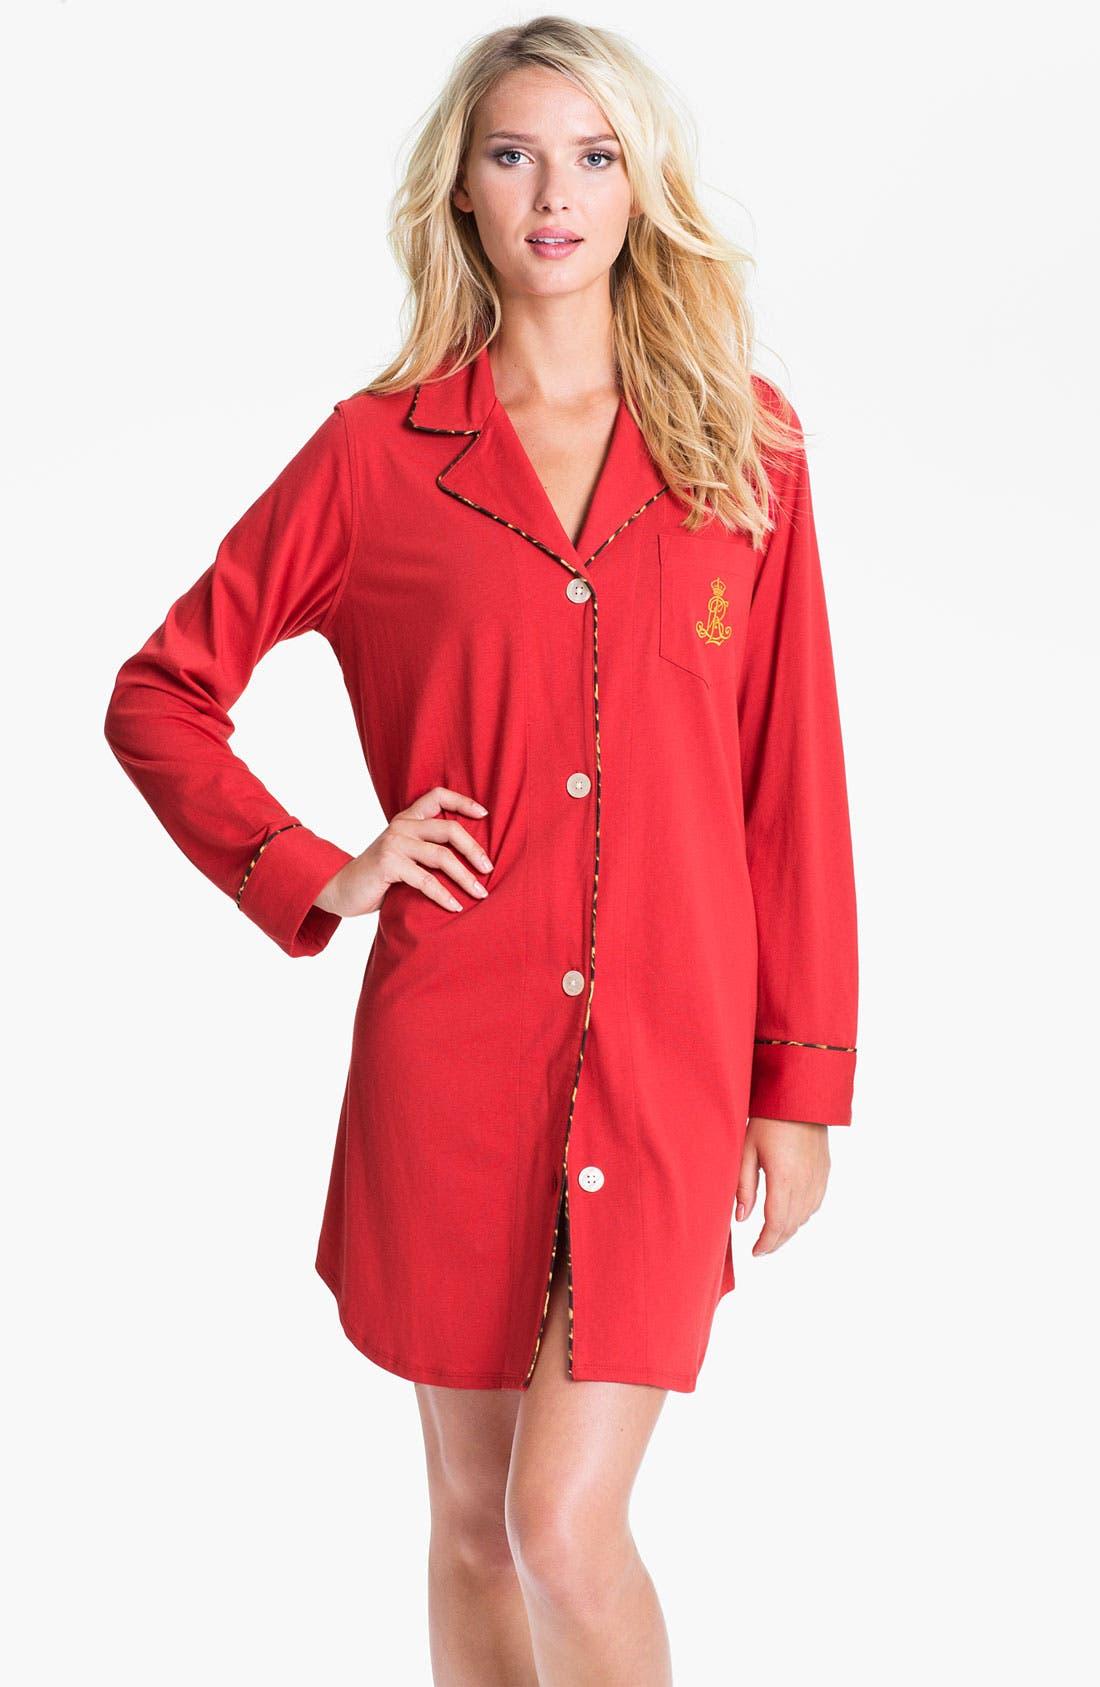 Main Image - Lauren Ralph Lauren Sleepwear Knit Nightshirt